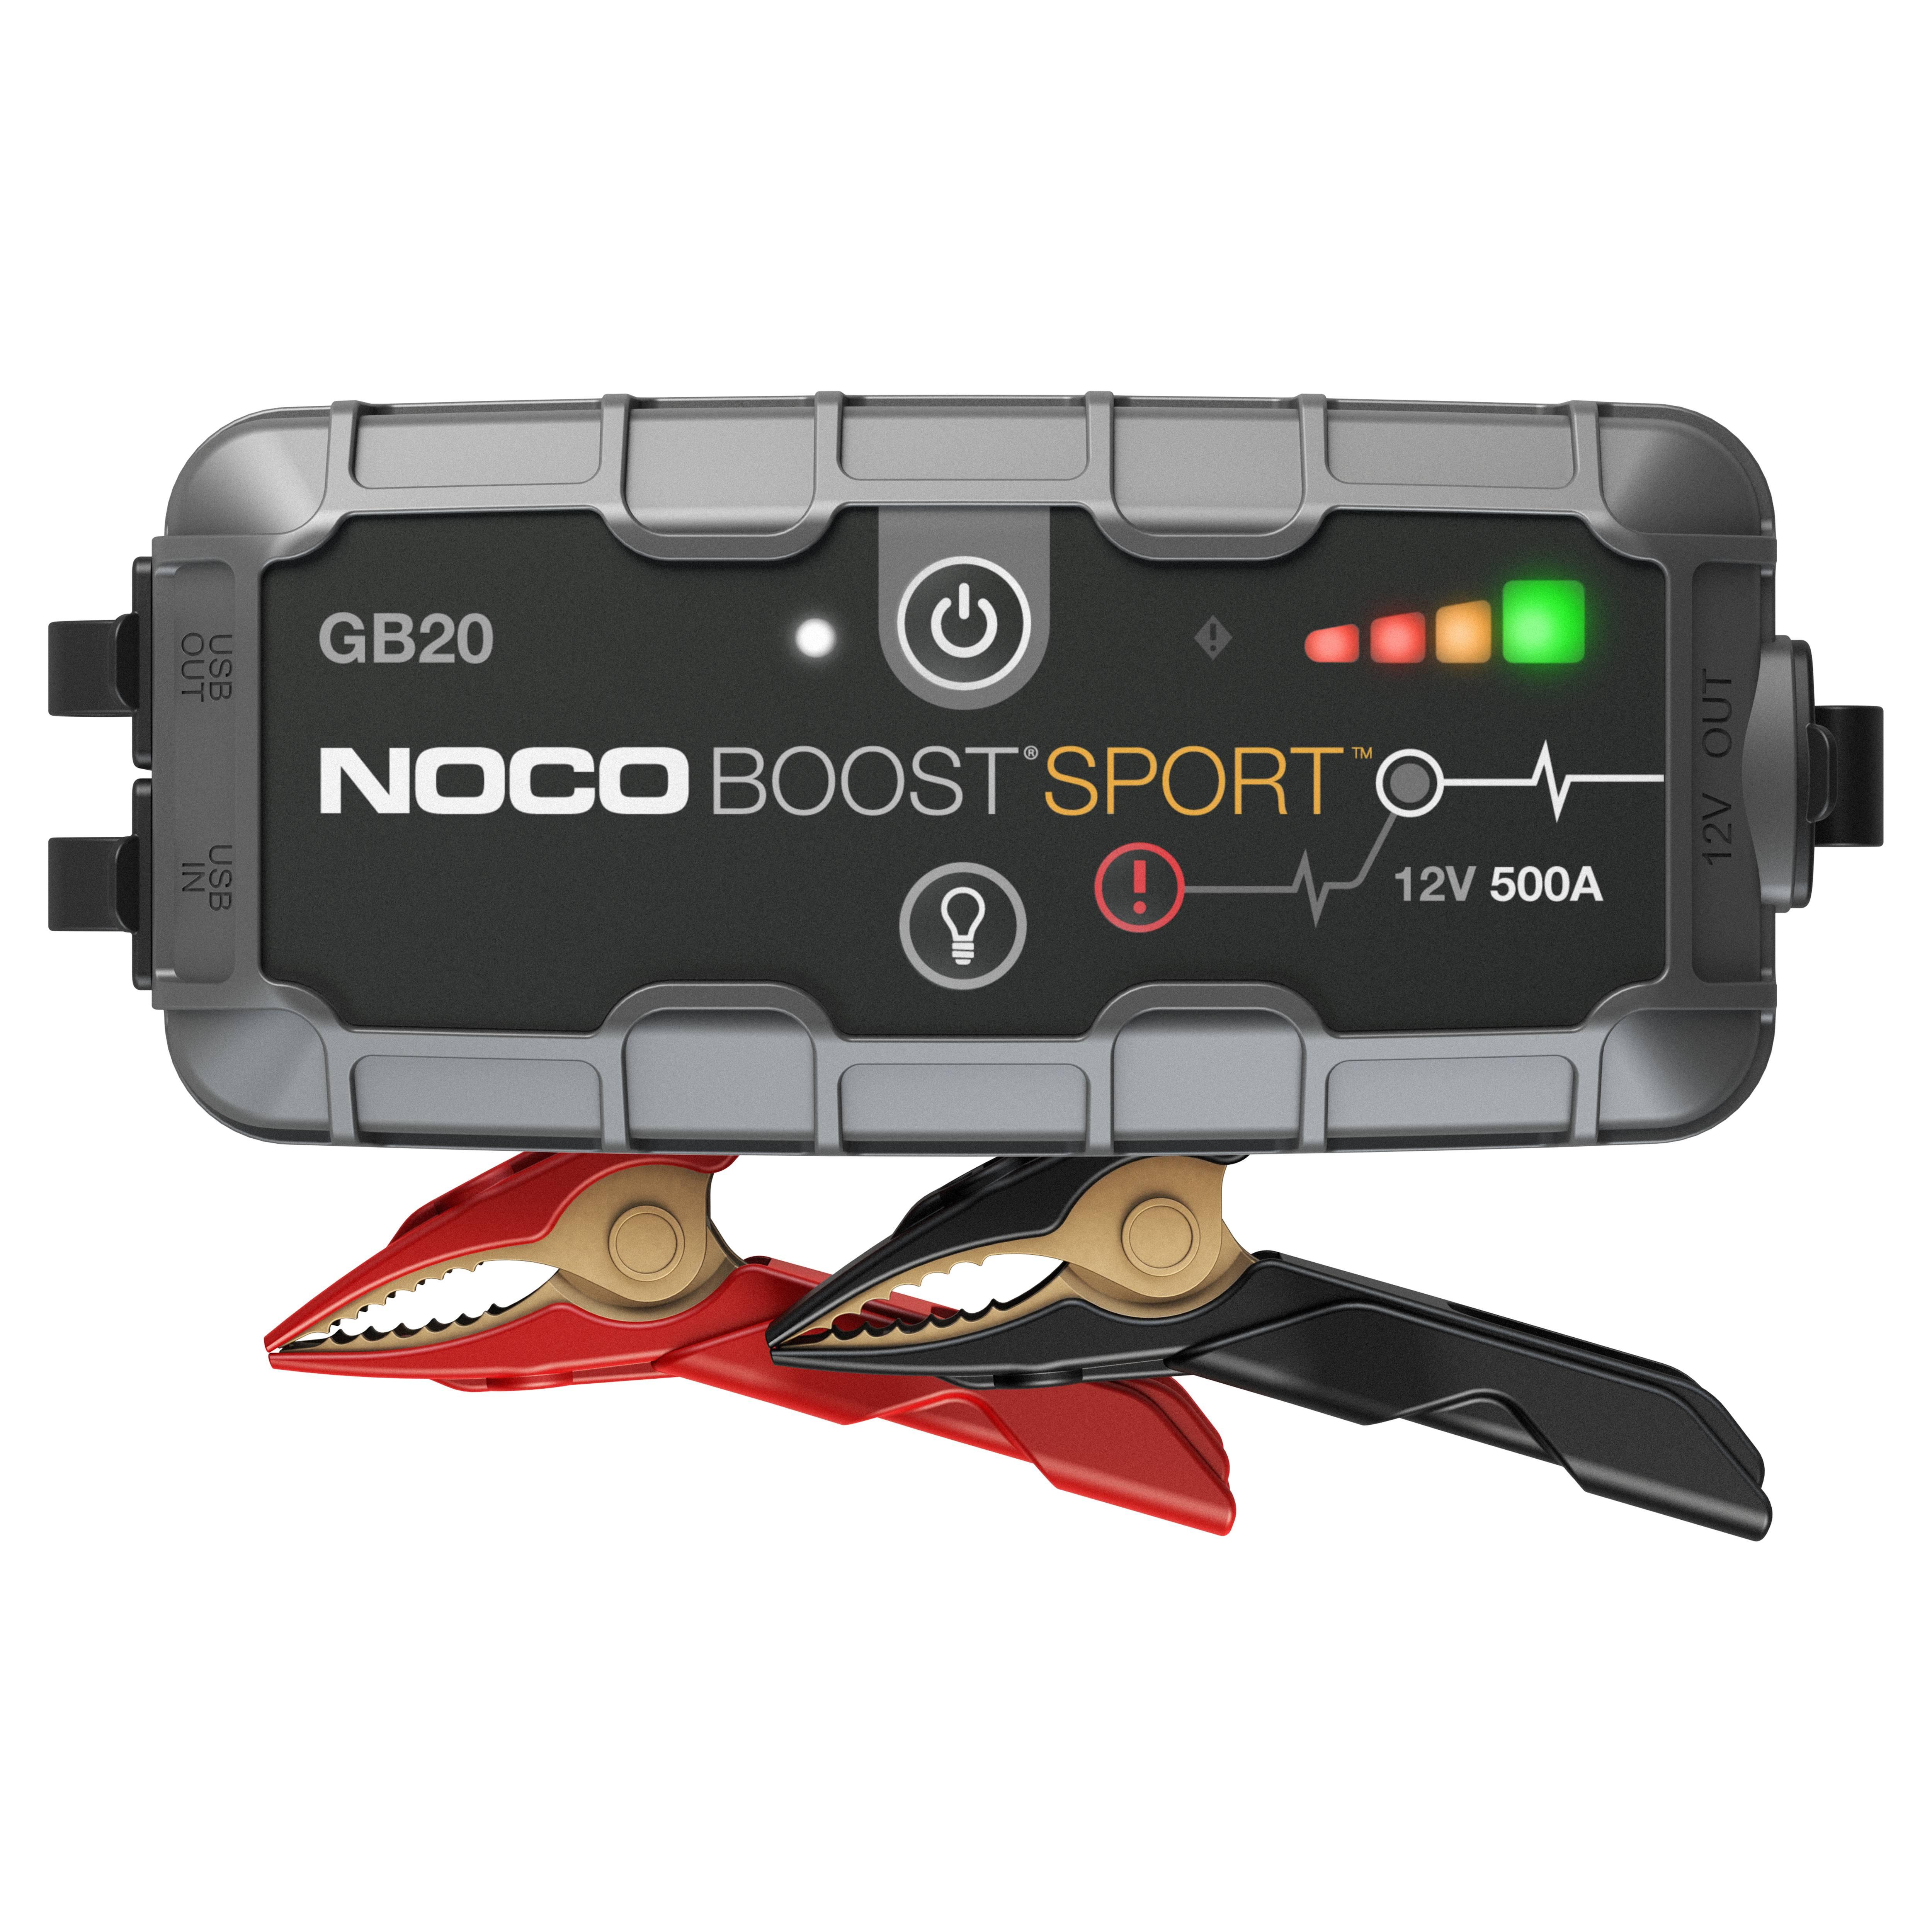 NOCO GB20 Boost 12V 500A akkumulátor bikázó